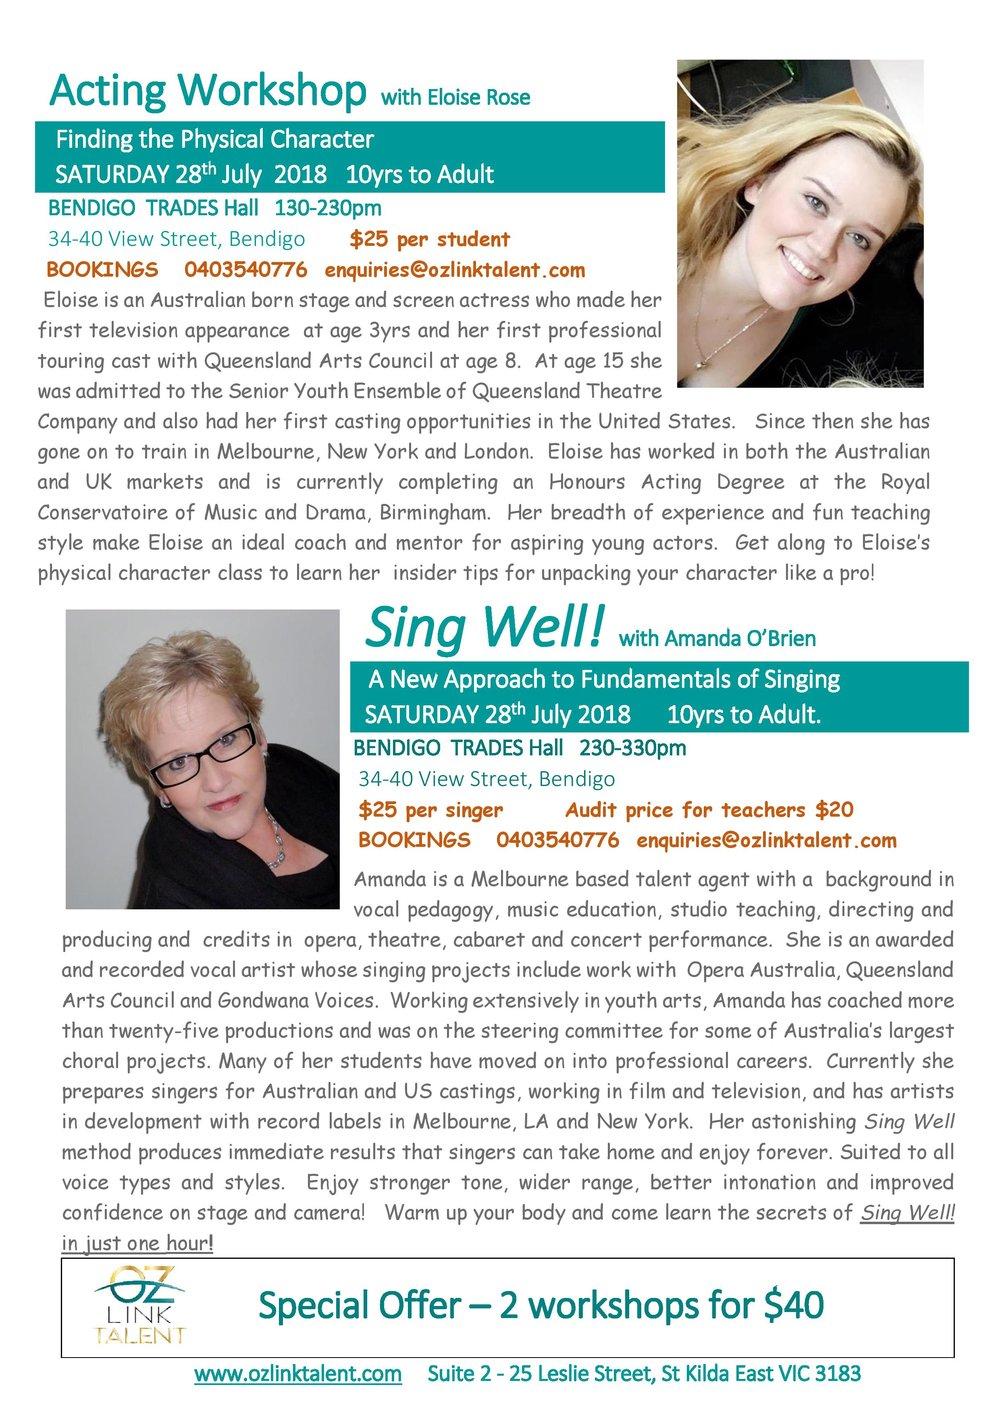 Amanda & Eloise workshops-page-001.jpg